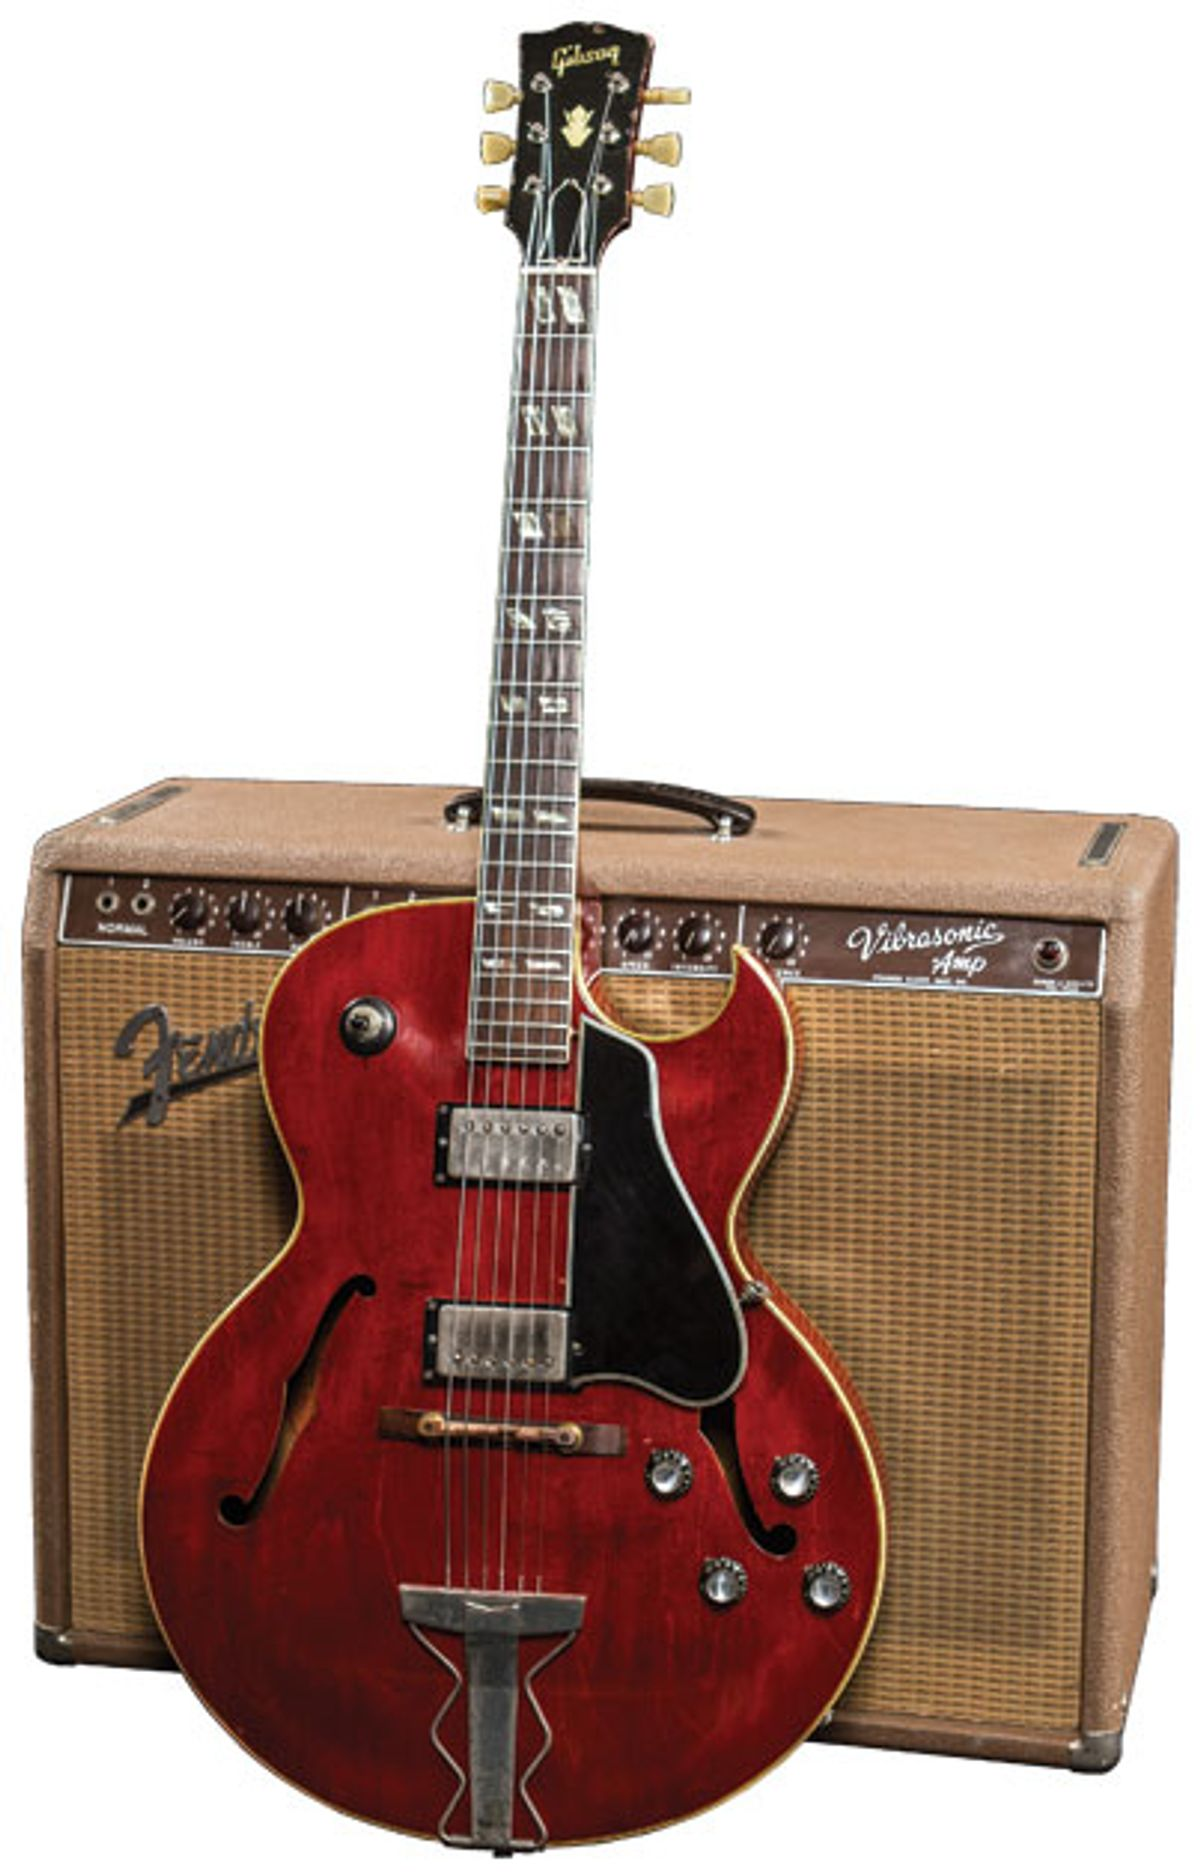 Vintage Vault: 1962 Gibson ES-175D